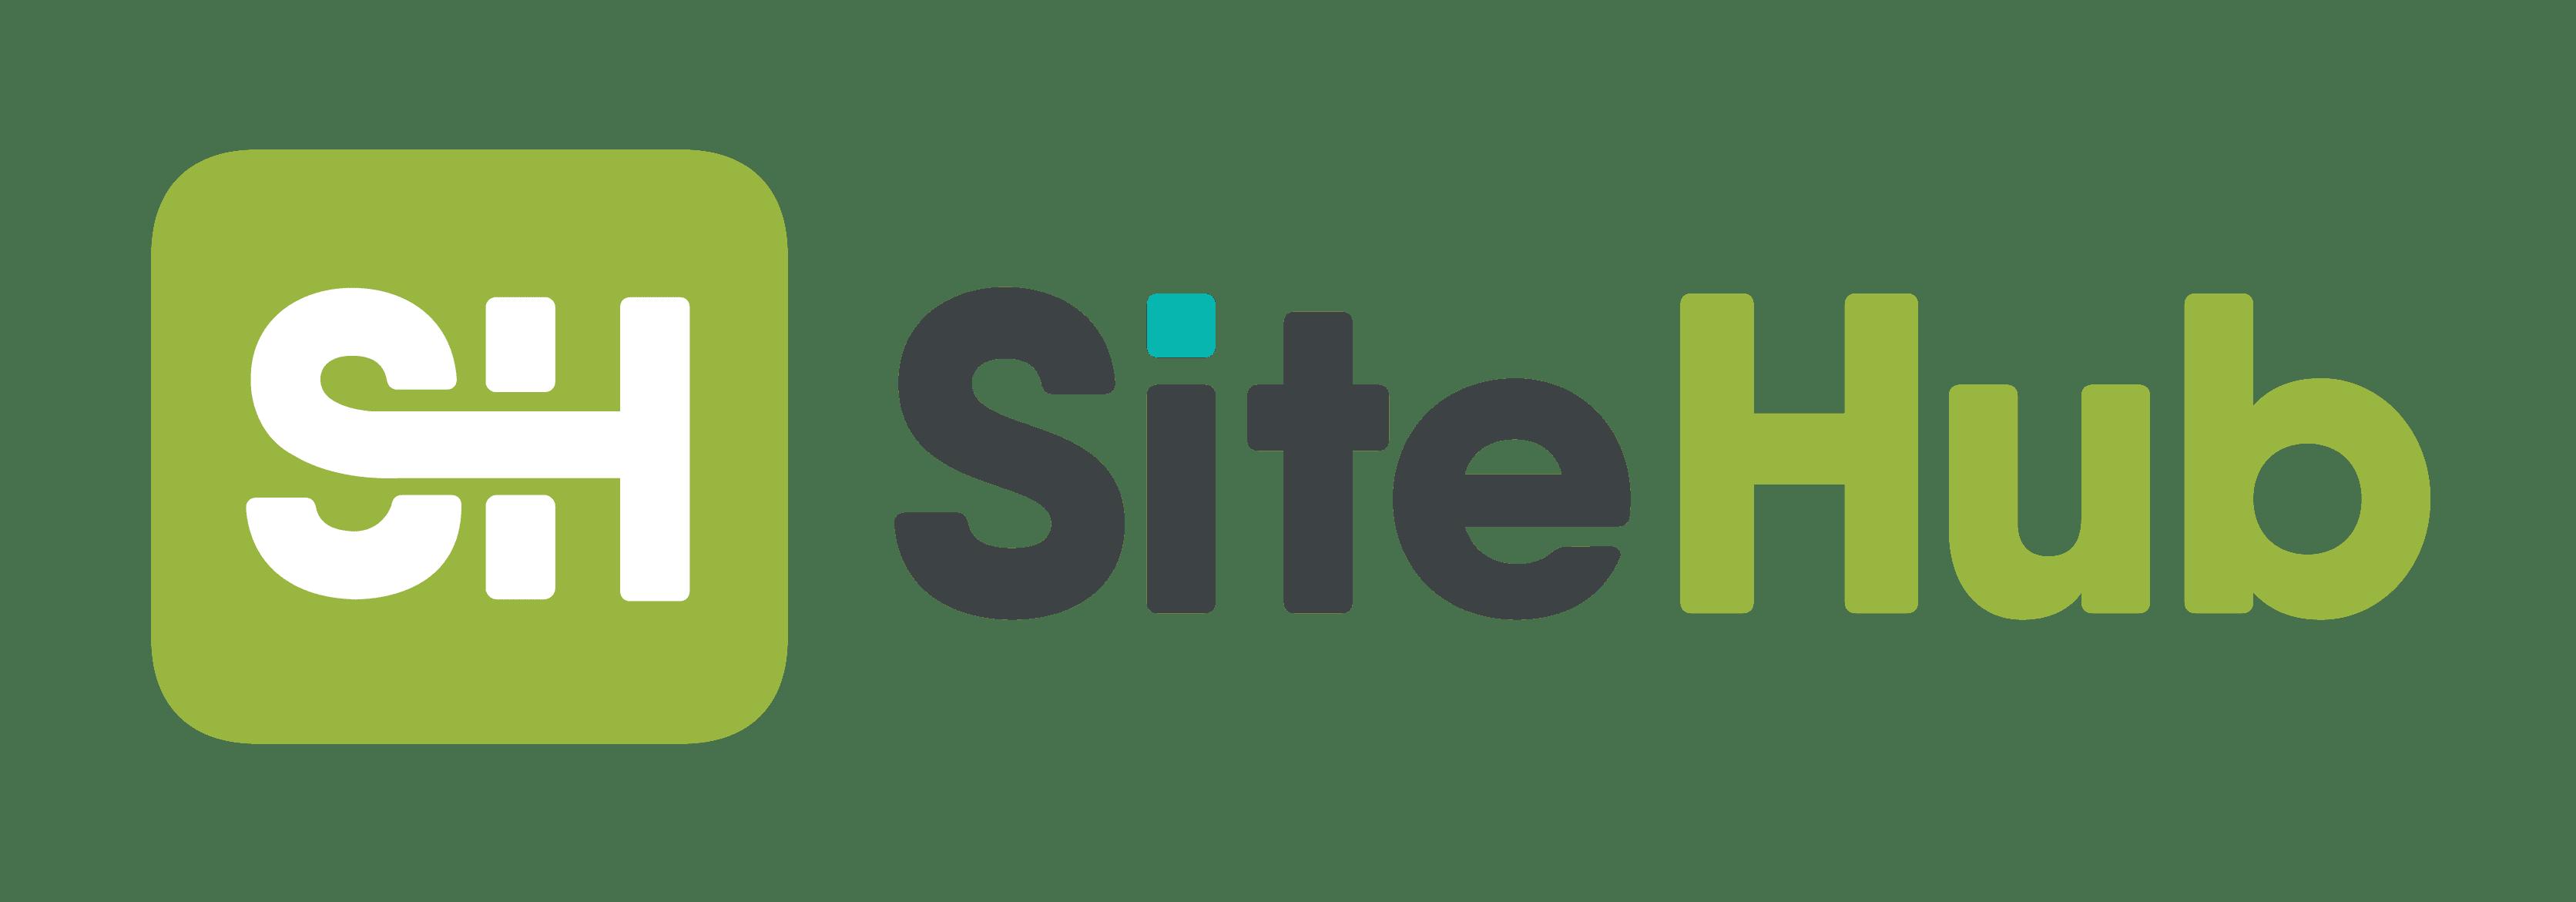 dating siti Web Rochester NY